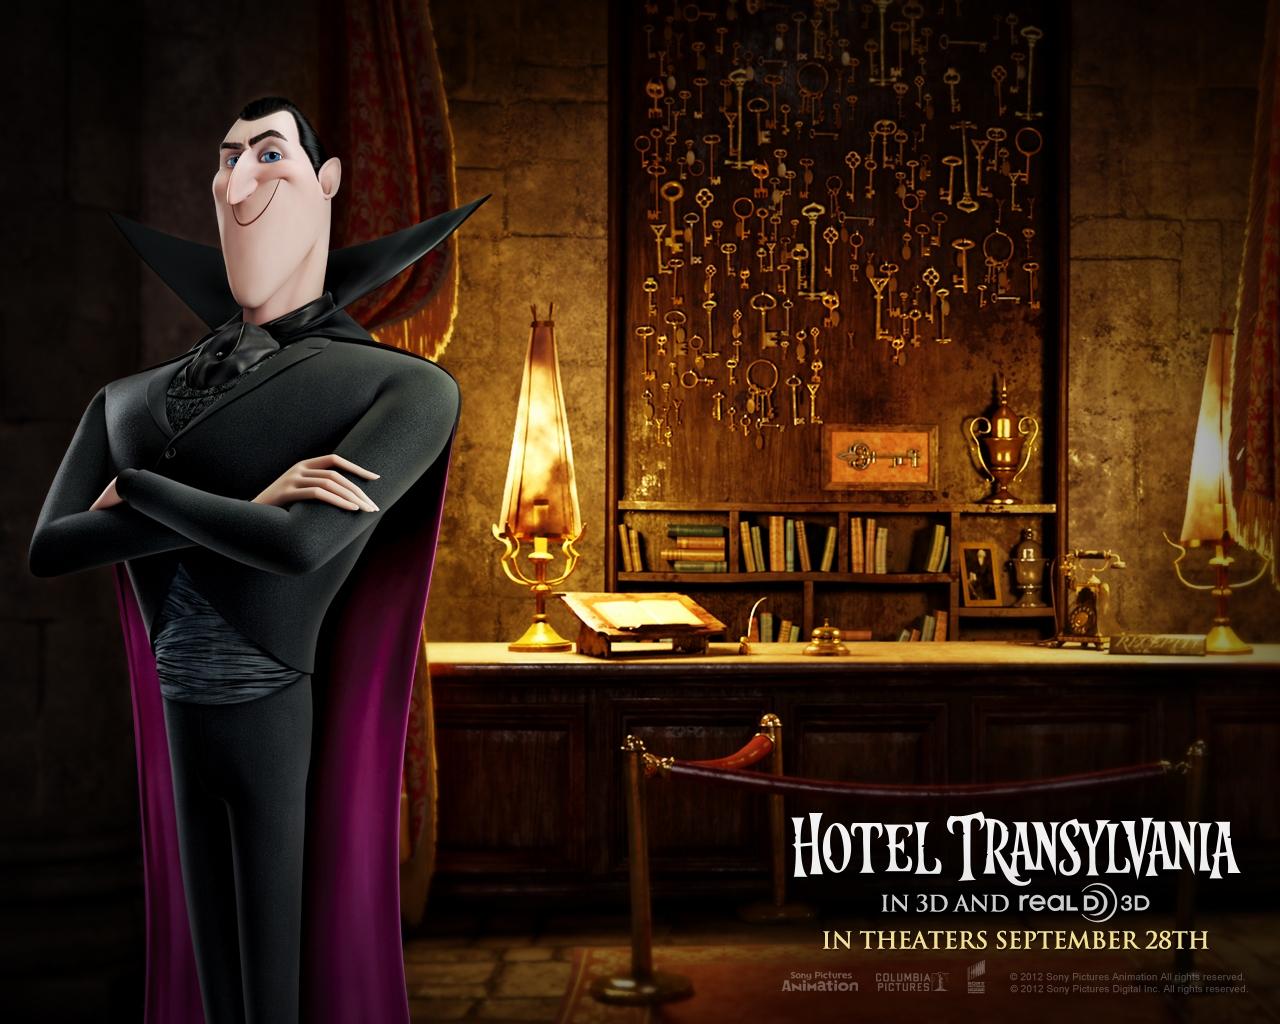 http://1.bp.blogspot.com/-SciXkq8-AnU/UM6bcikTXEI/AAAAAAAAE9Y/P5WppqDGH94/s1600/1+hotel-transylvania-wp-2.jpg